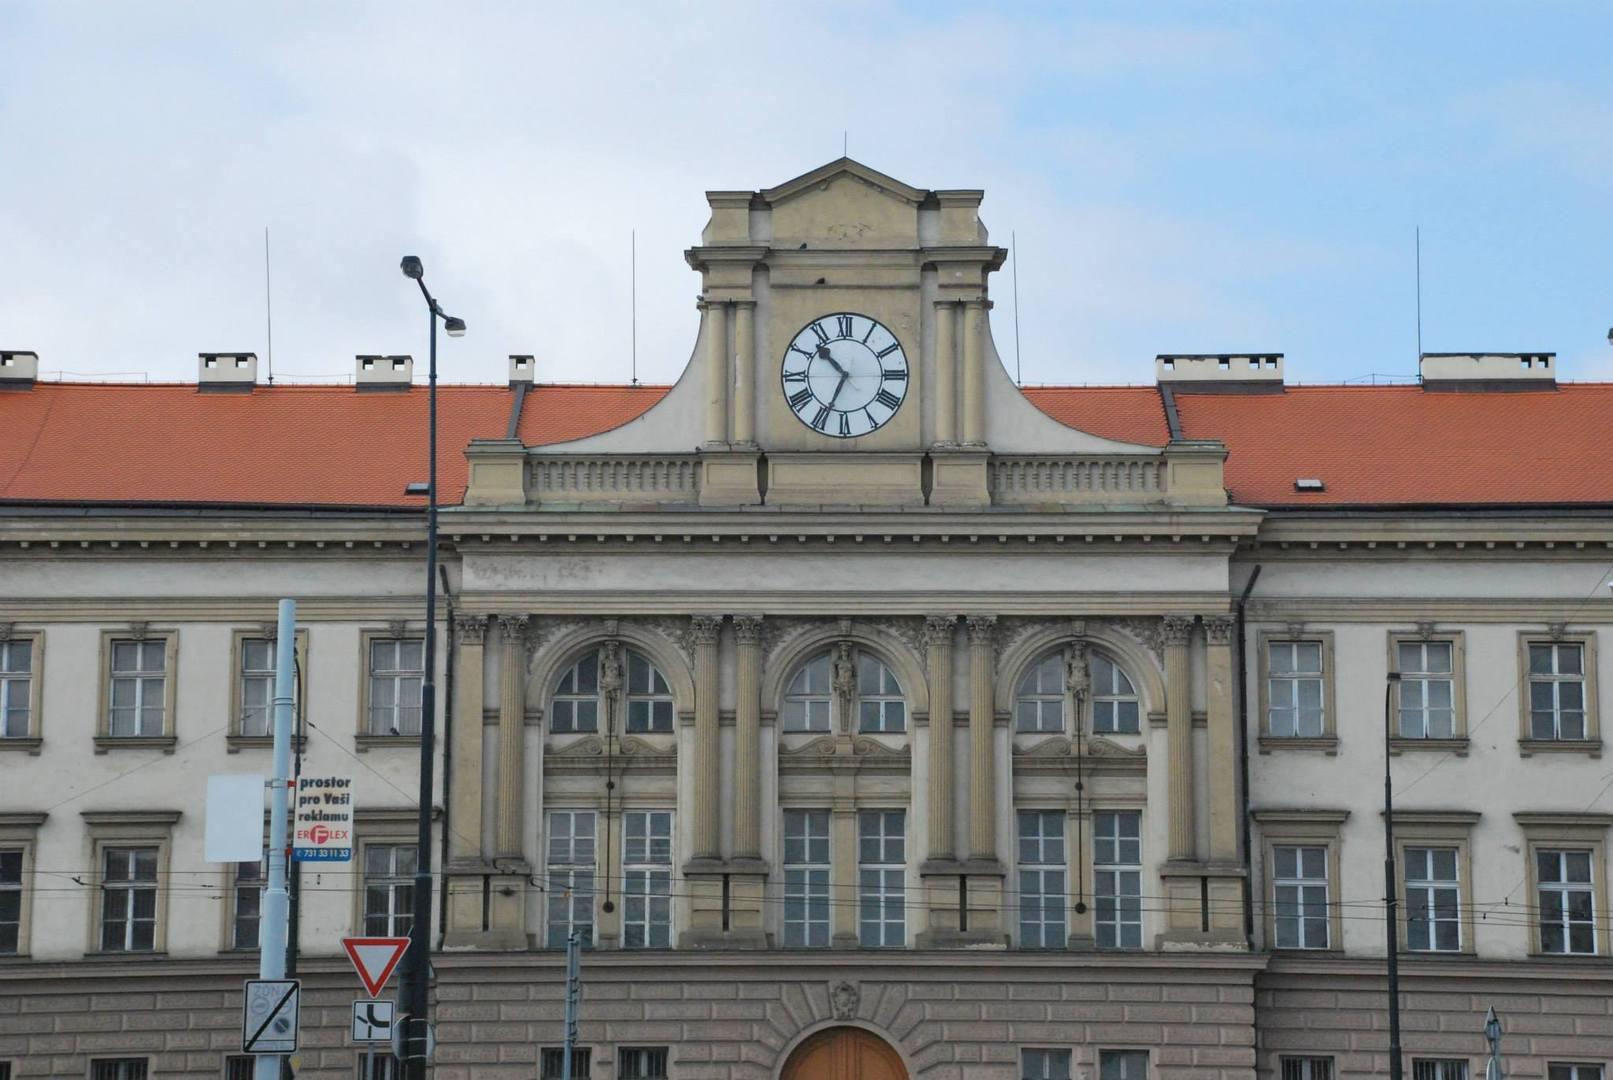 בניין עם השעון